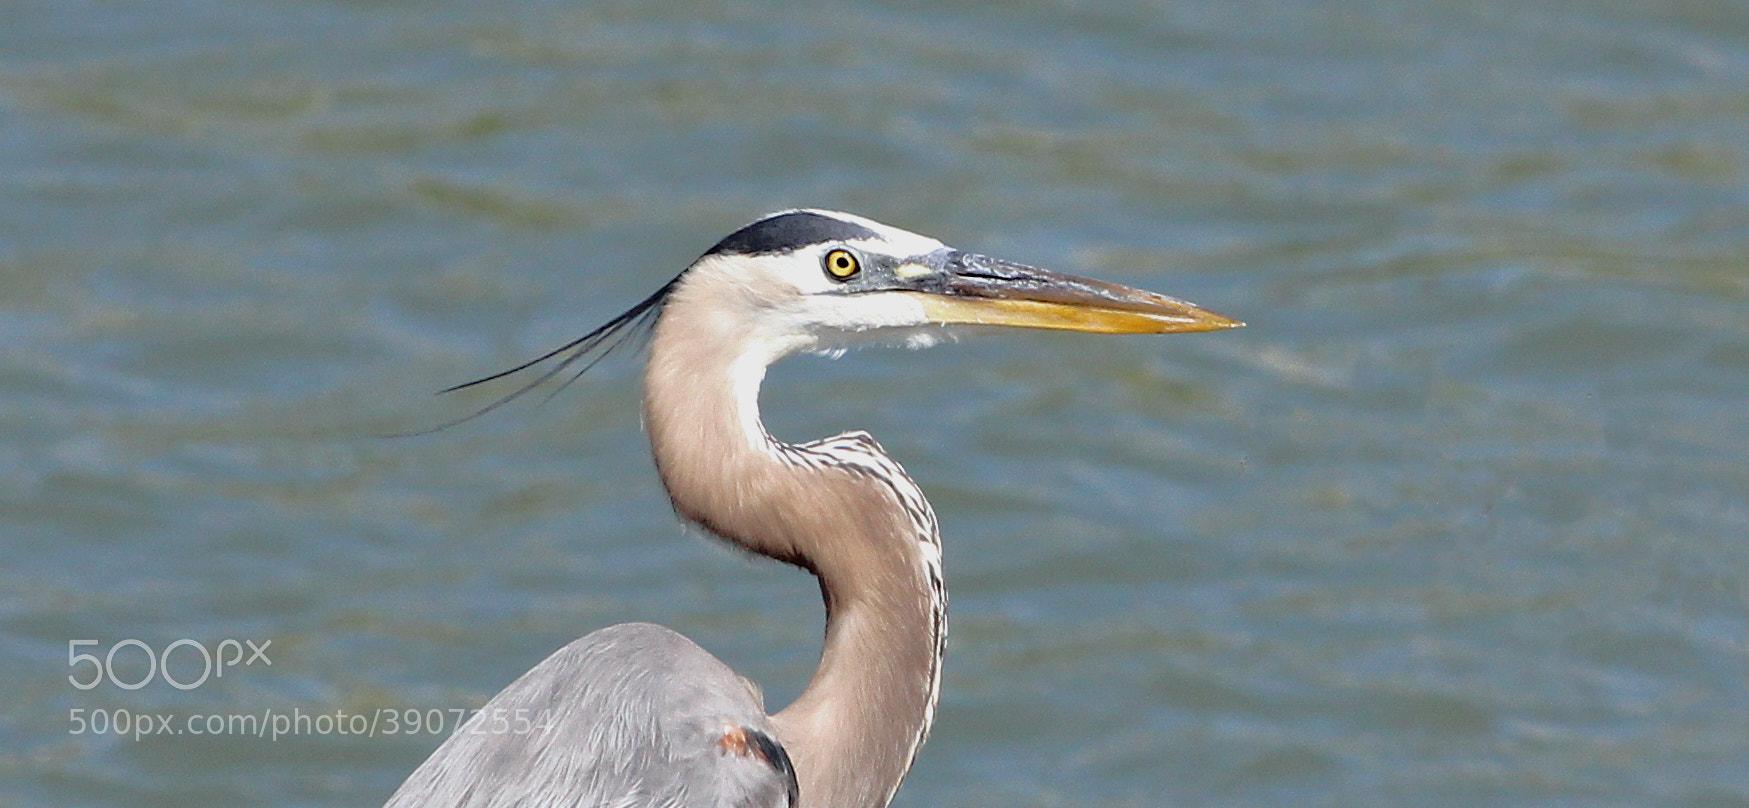 Photograph Great Blue Heron by Jason McSpadden on 500px